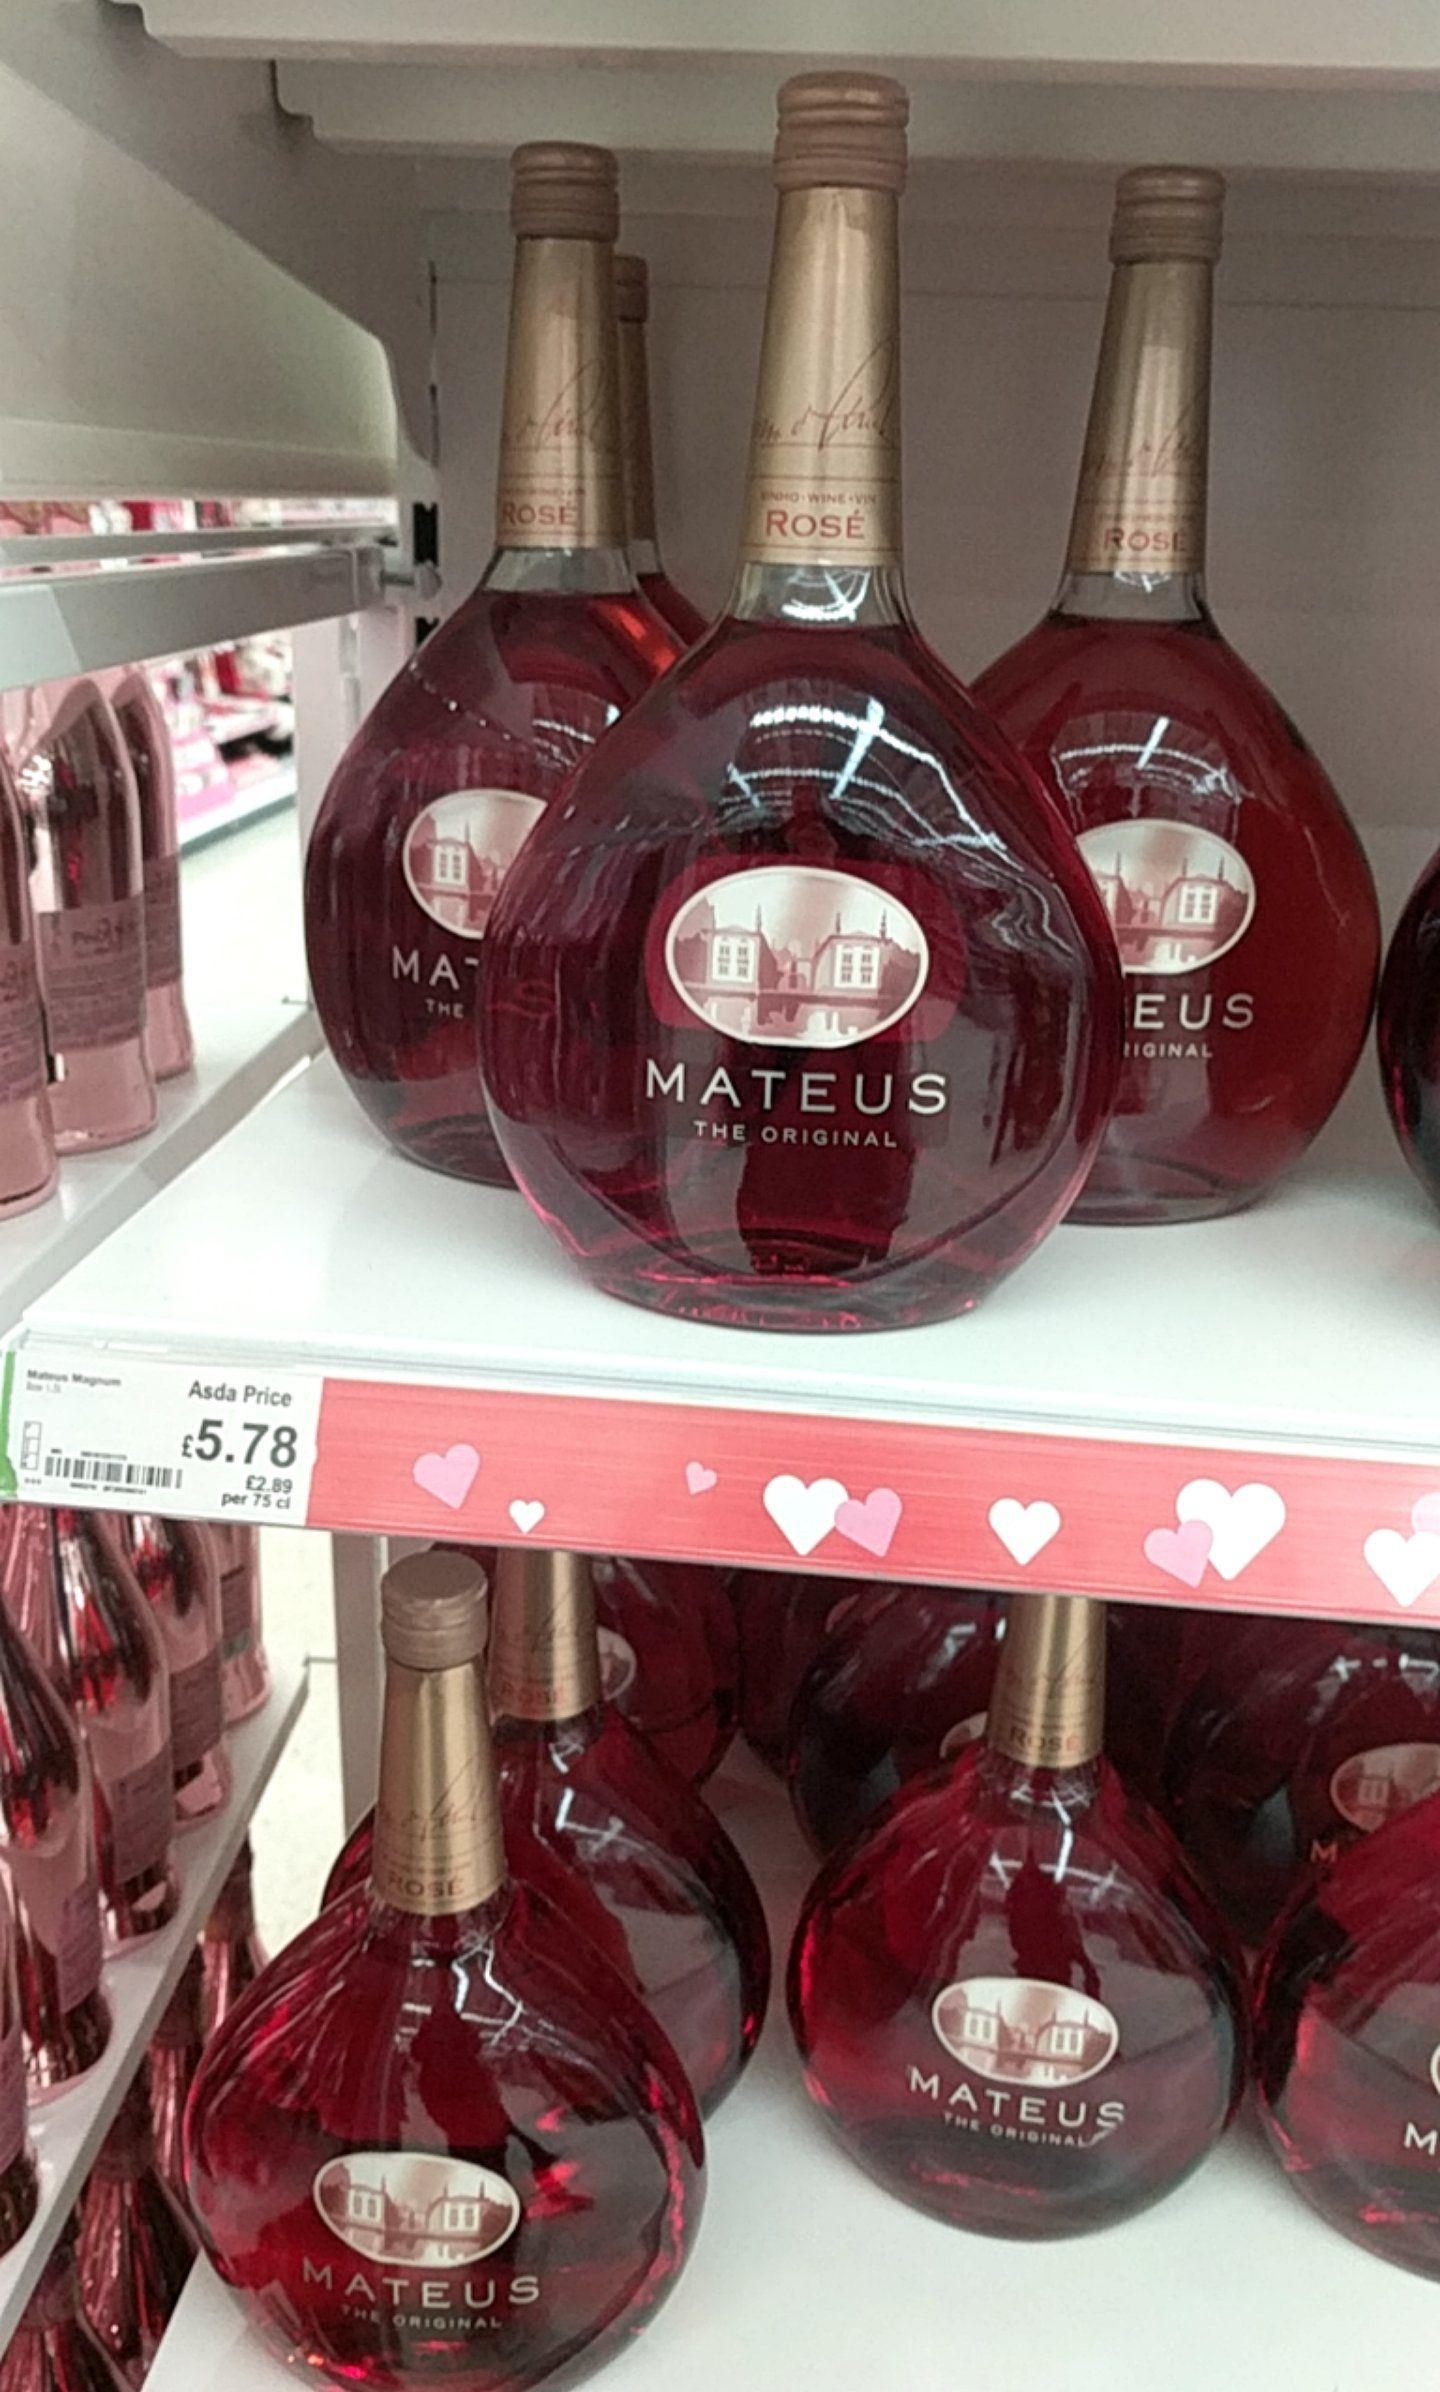 Mateus rose wine 15l 578 asda wigan hotukdeals fandeluxe Choice Image